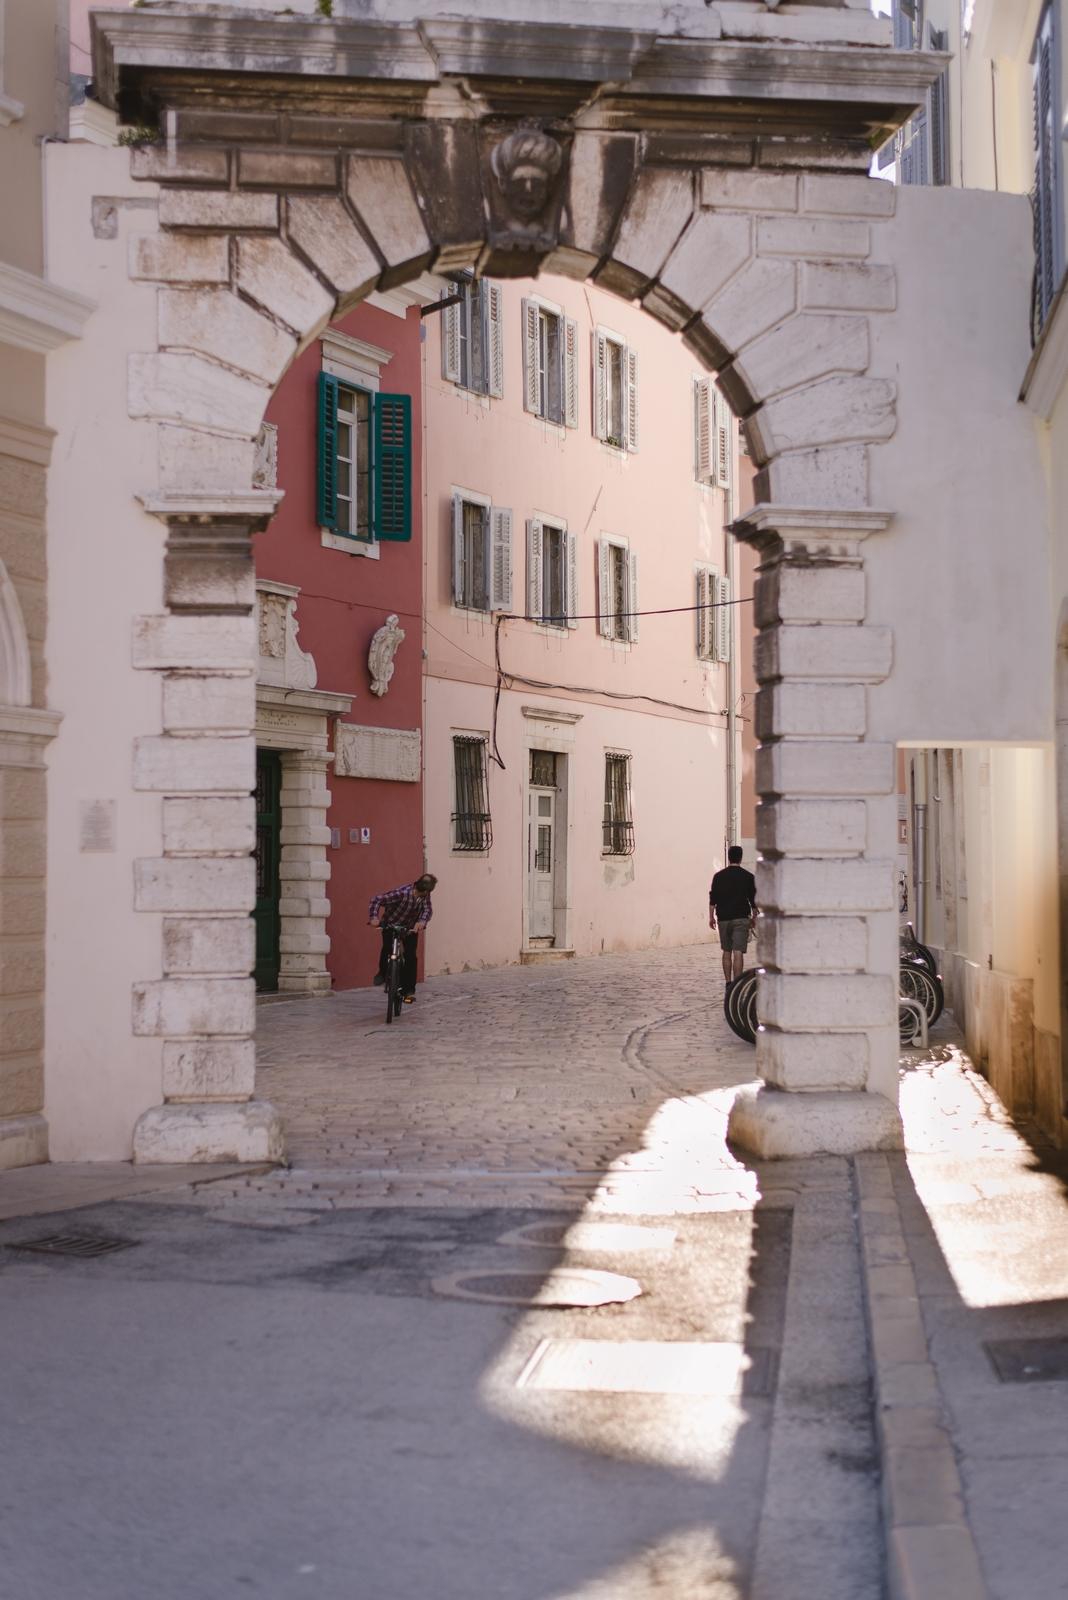 Balbijev Luk, a historic city gate in Rovinj, Croatia - from travel blog http://Epepa.eu